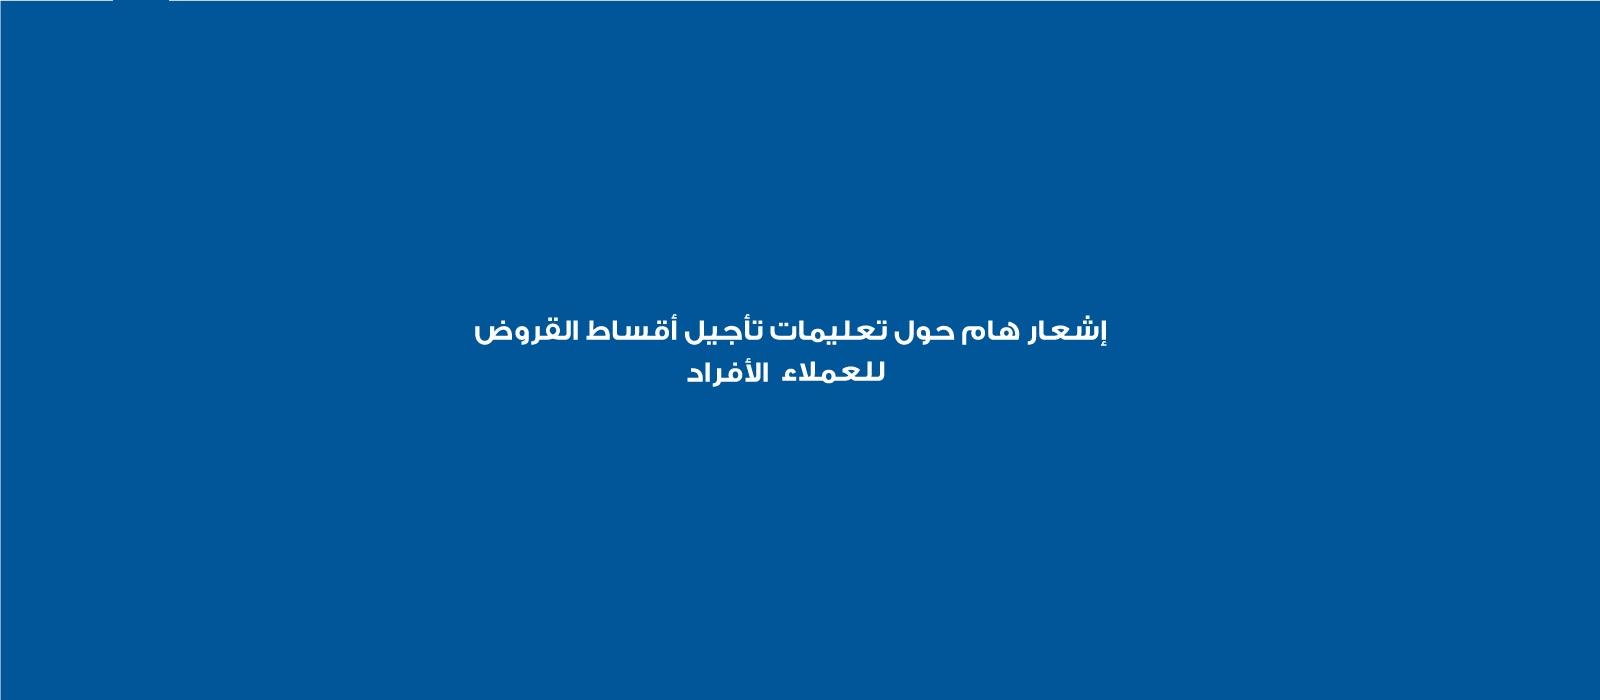 Website-banner-1600x700-Bahrain-A